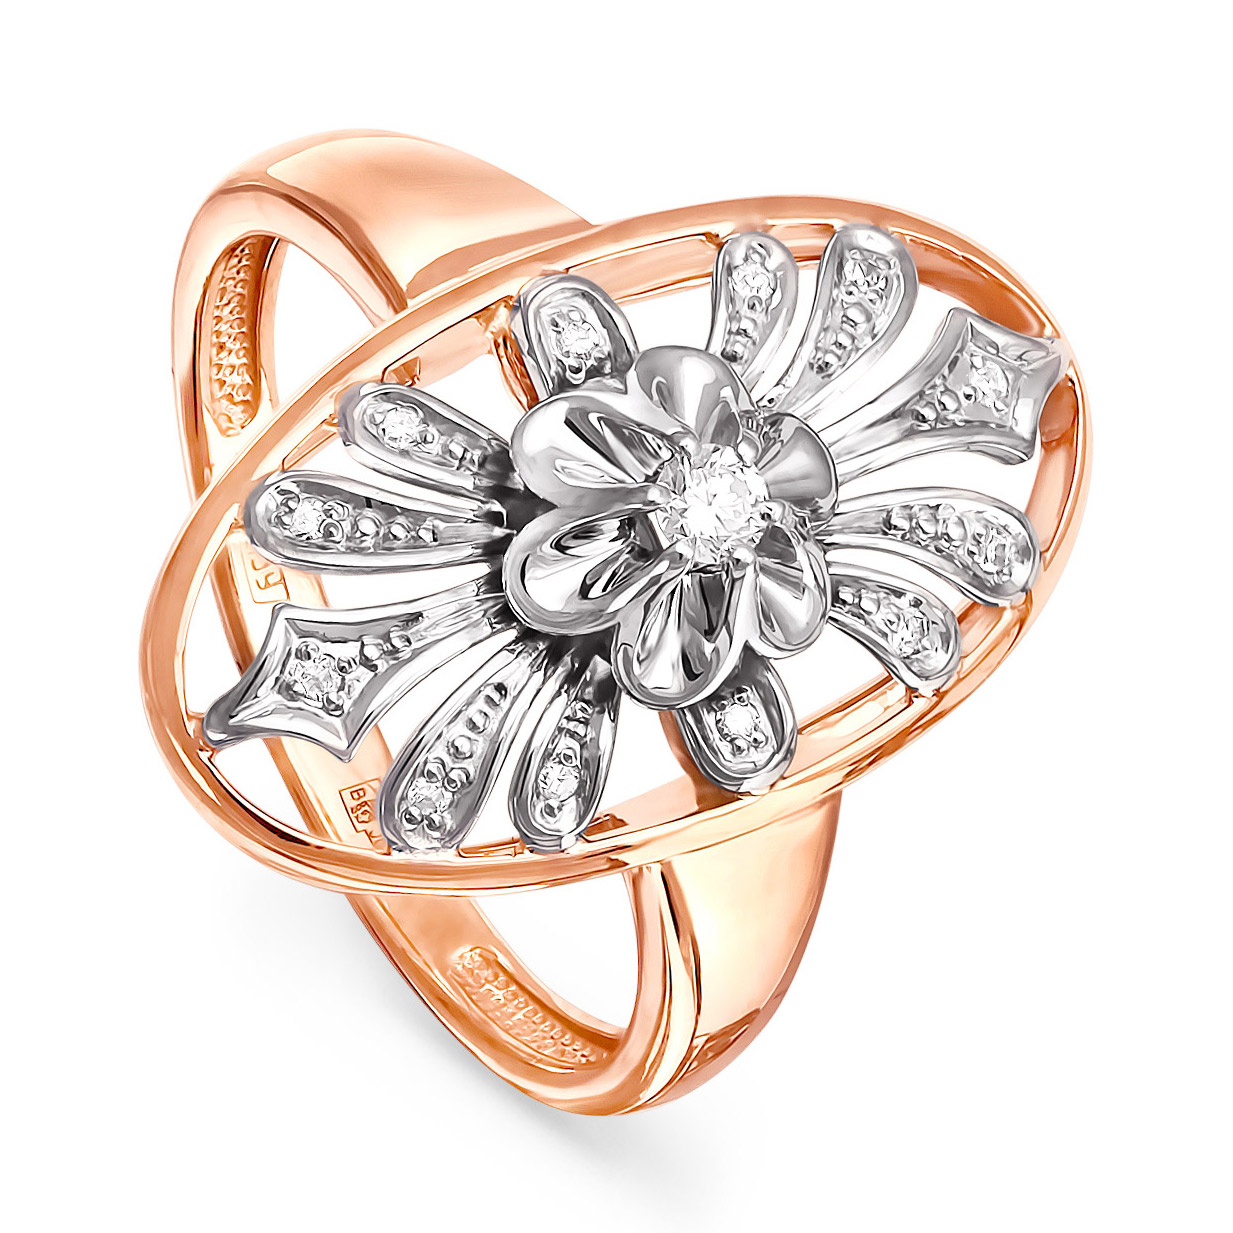 Золотое кольцо Бриллиант арт. 11-0564-1000 11-0564-1000